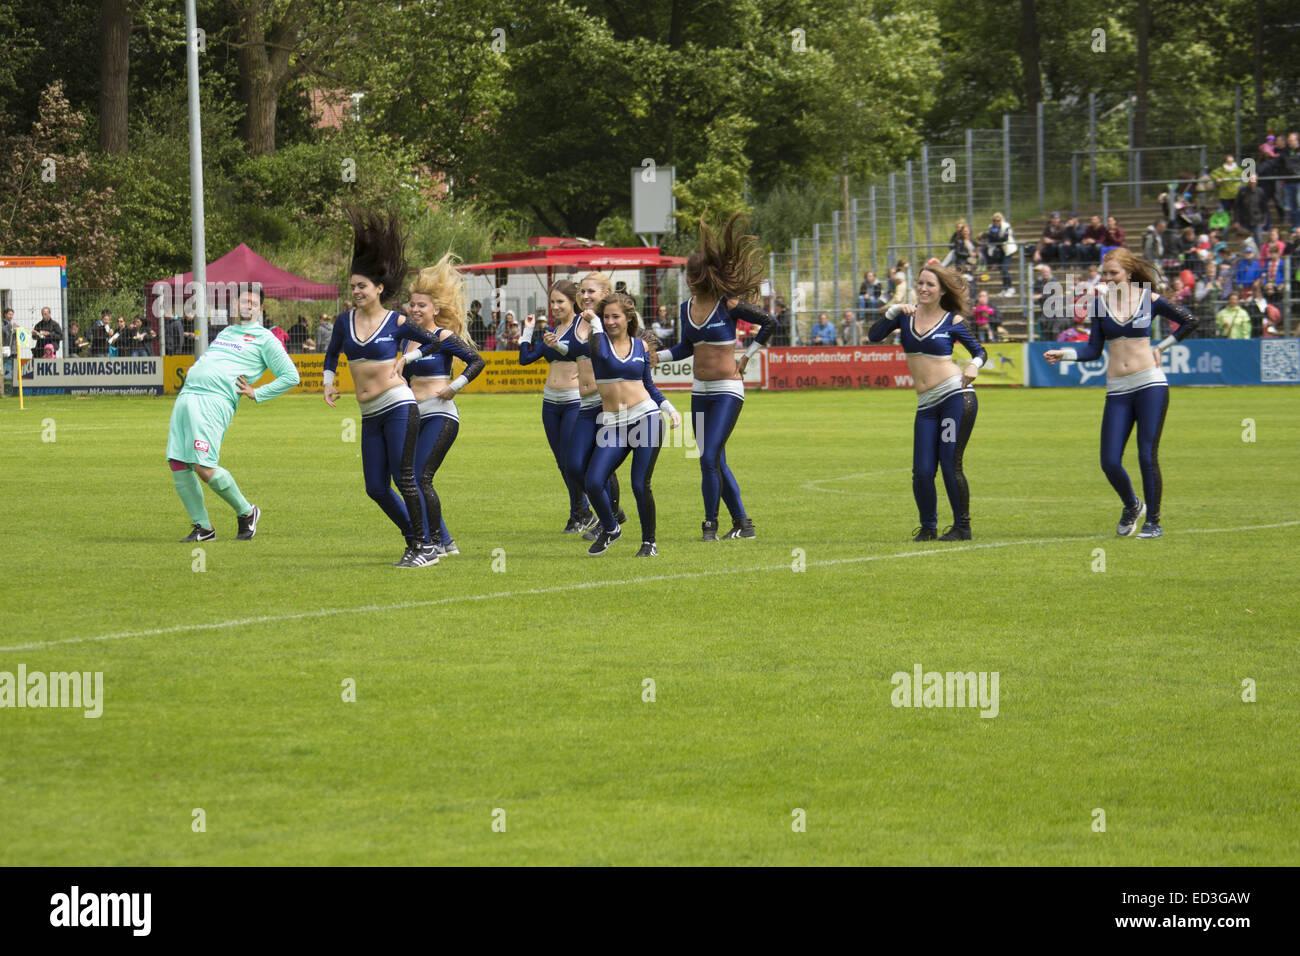 Mit Football 2014